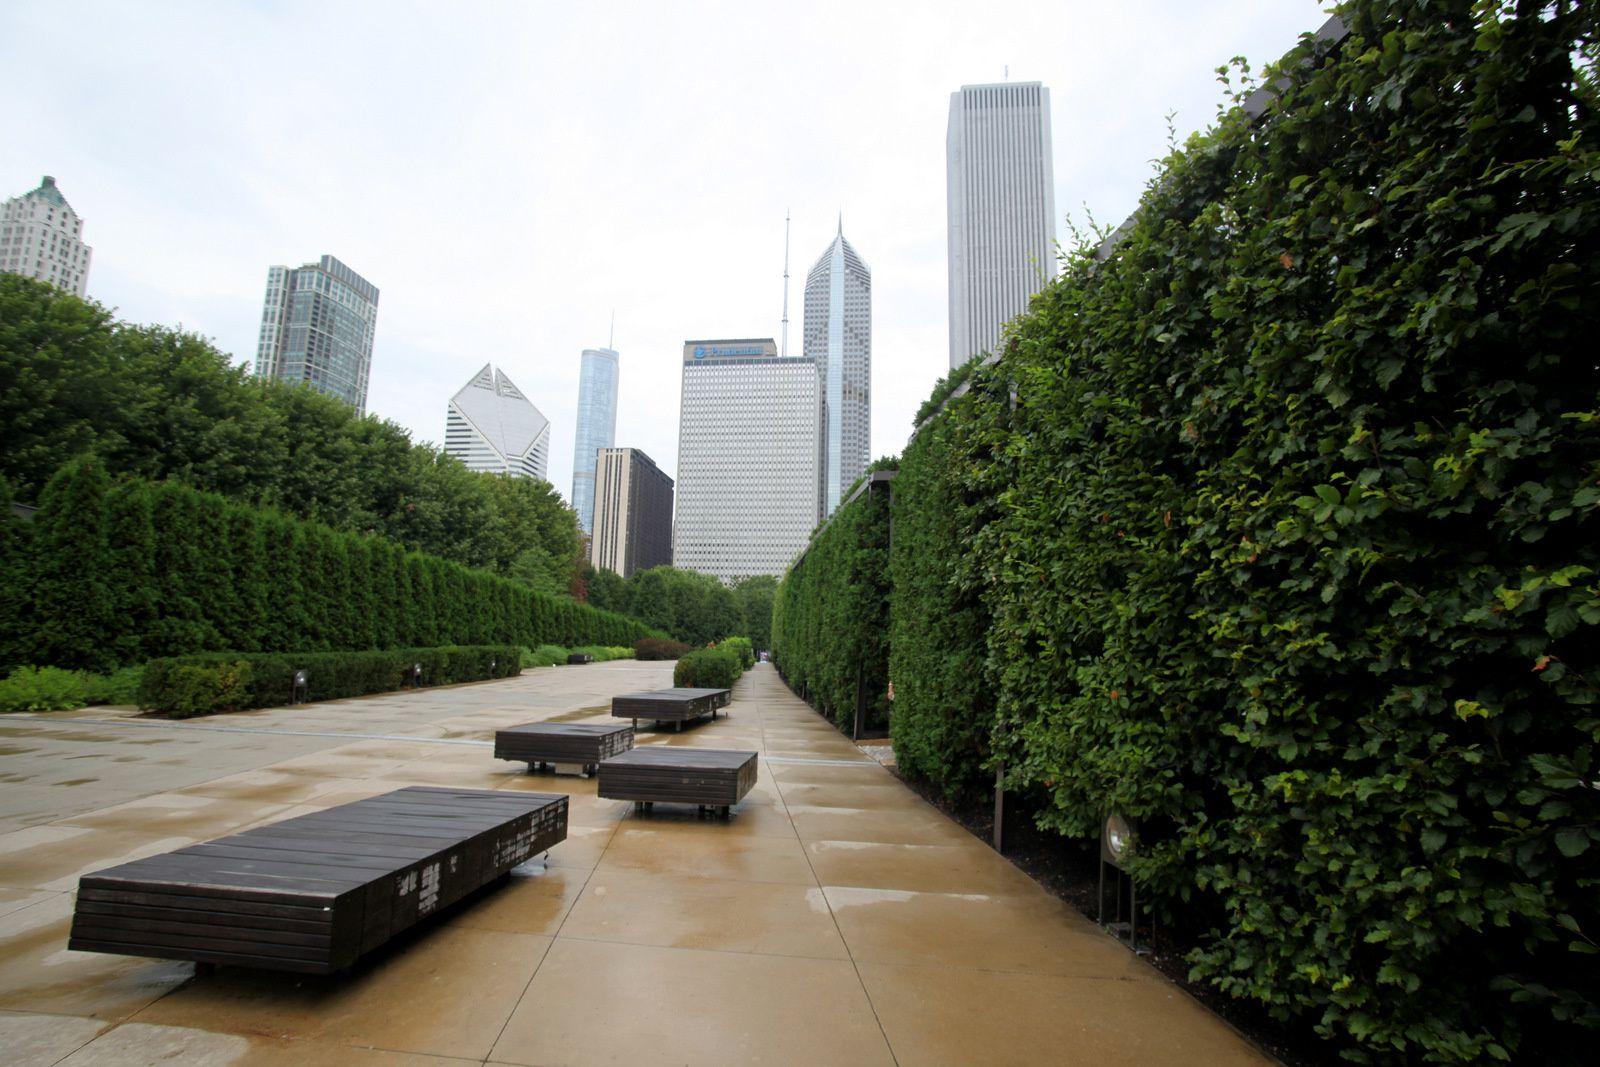 Chicago New York. (Saison 6)